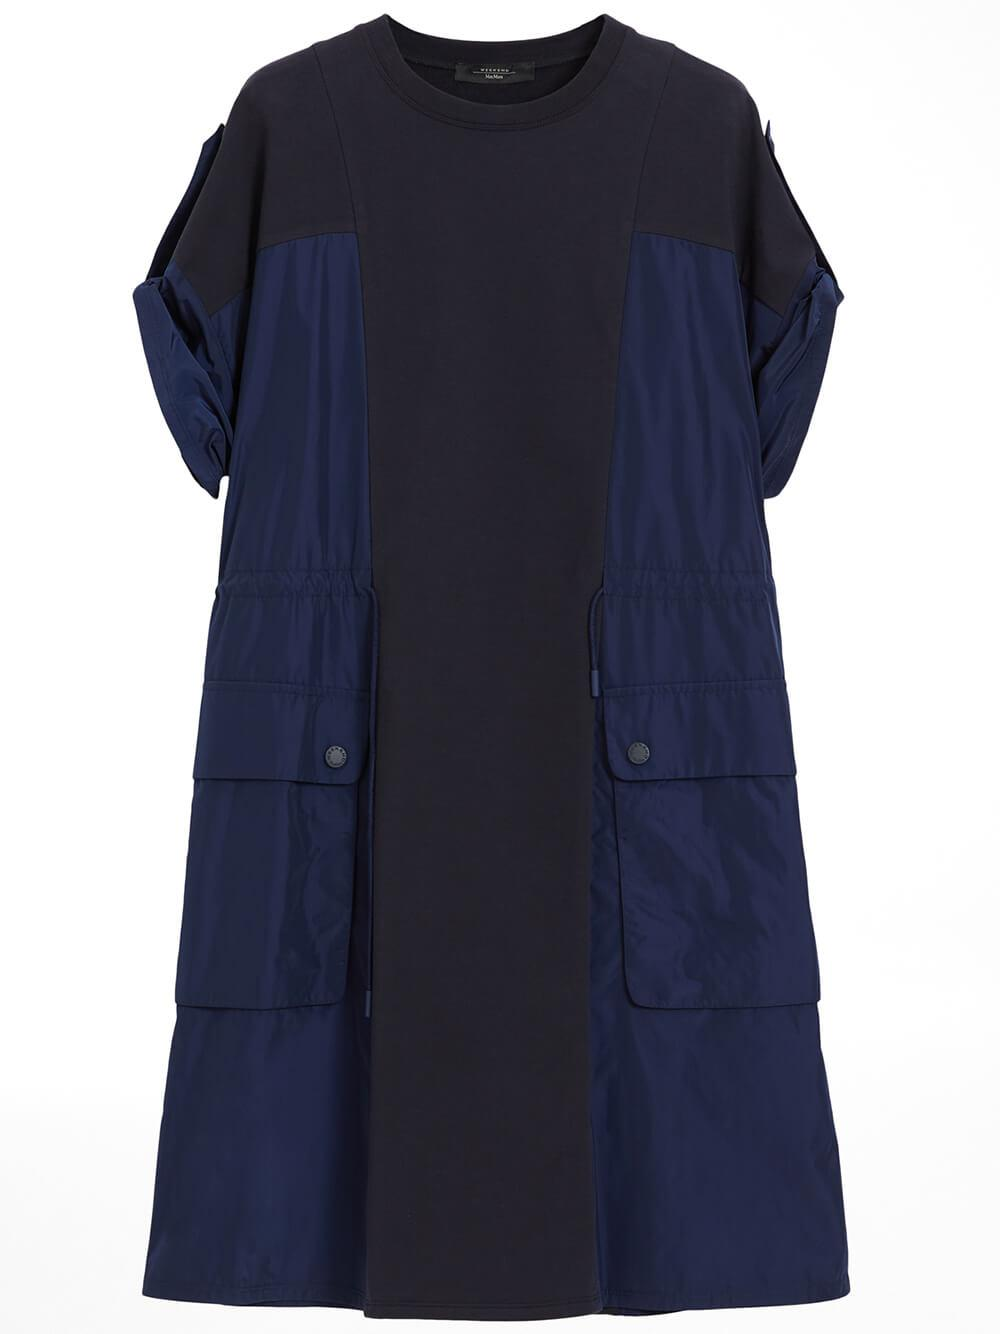 Colorblock Dress Item # 56260119600